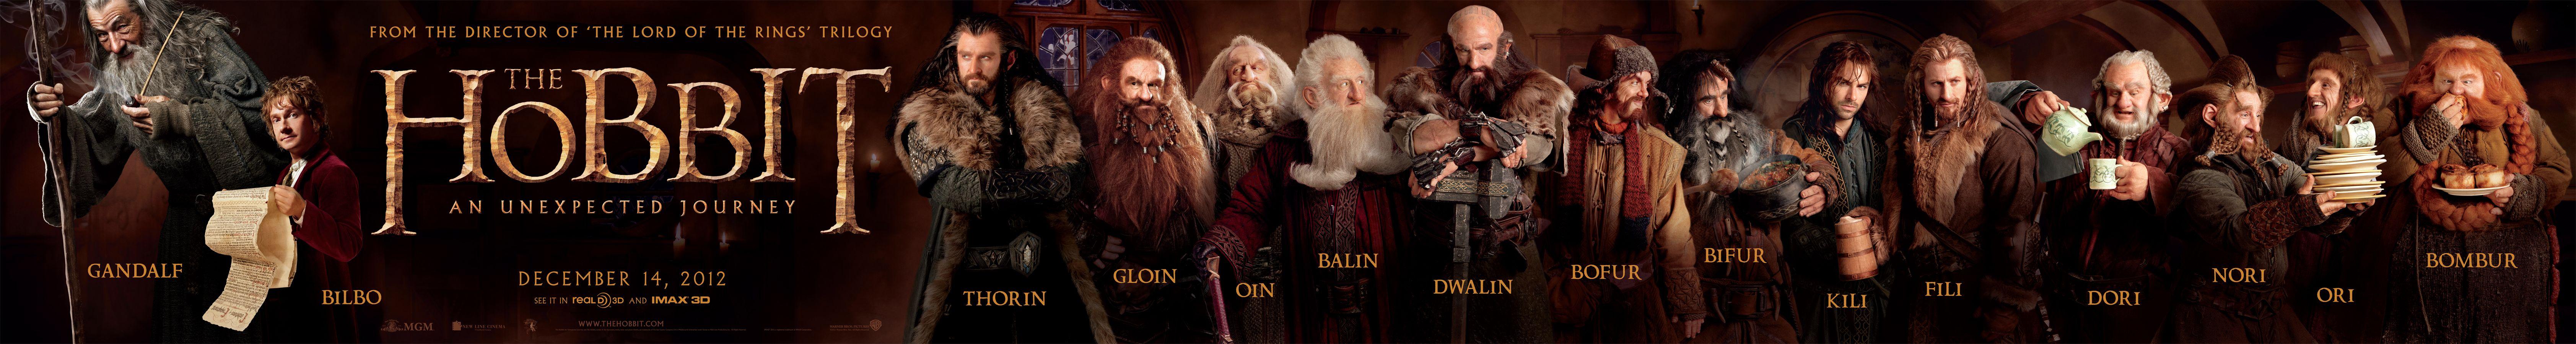 THE HOBBIT: AN UNEXPECTED JOURNEY Reveals a New Dwarf ...